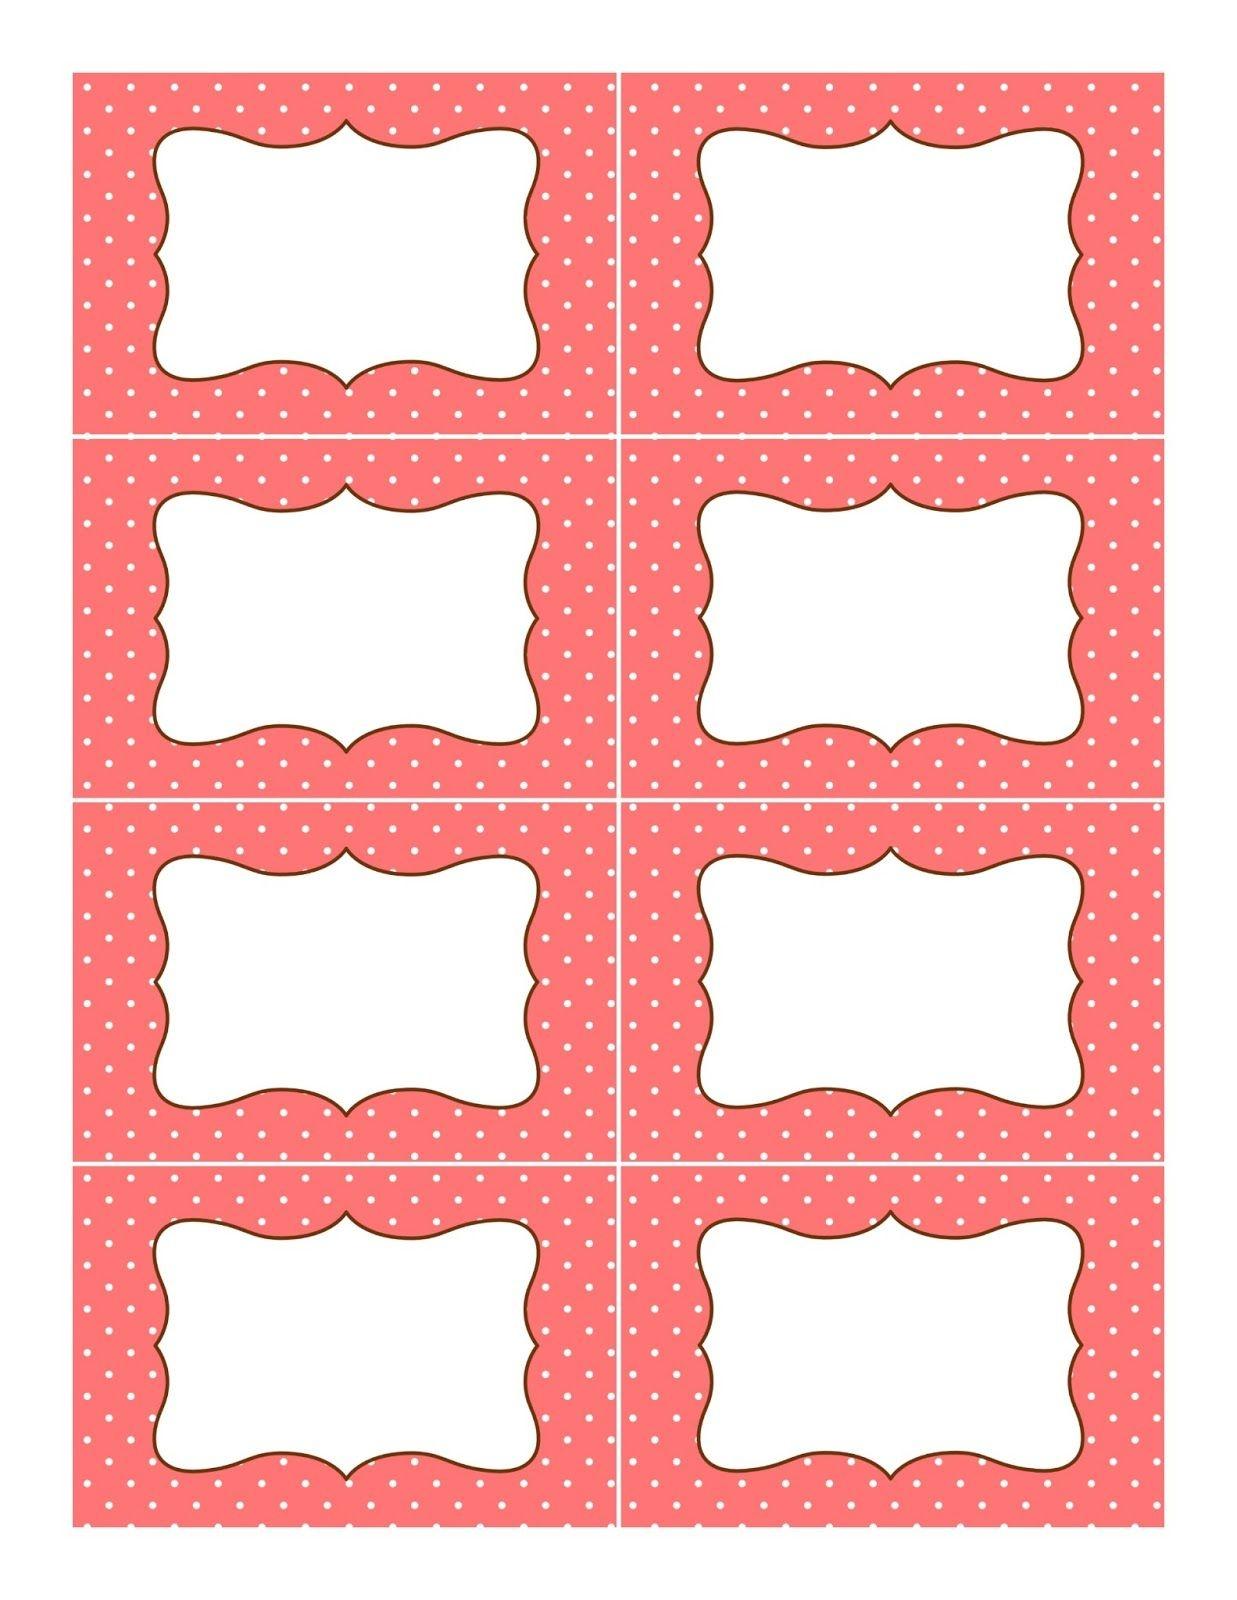 Pinbrenda Recinos On Labels | Printable Labels, Candy Buffet - Free Printable Candy Buffet Labels Templates